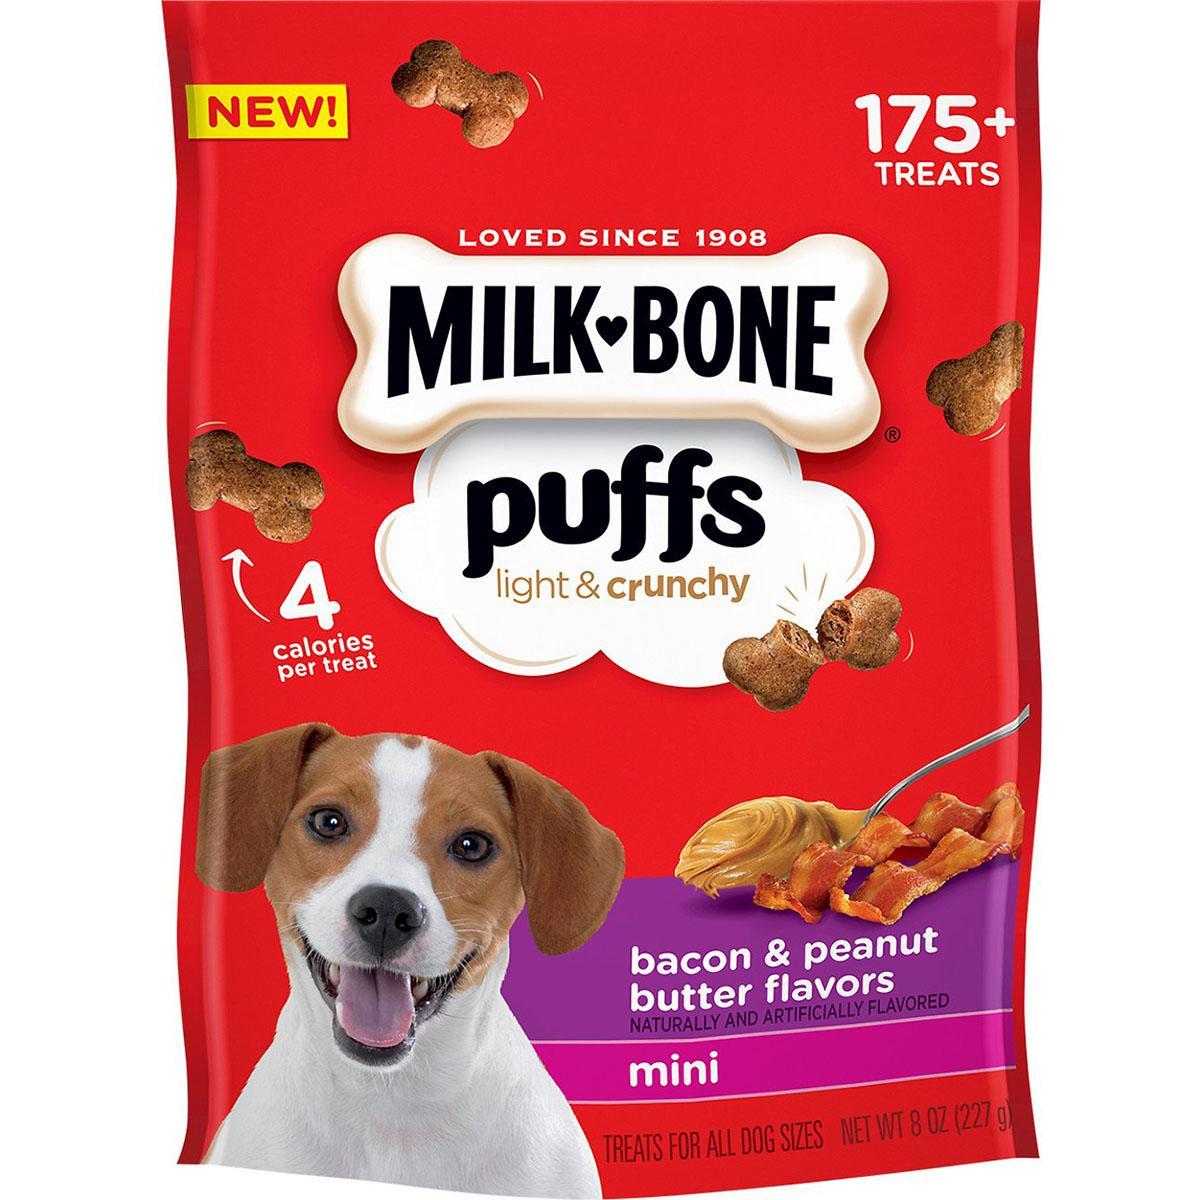 Milk-Bone Puffs Bacon & Peanut Butter Flavor Dog Treats